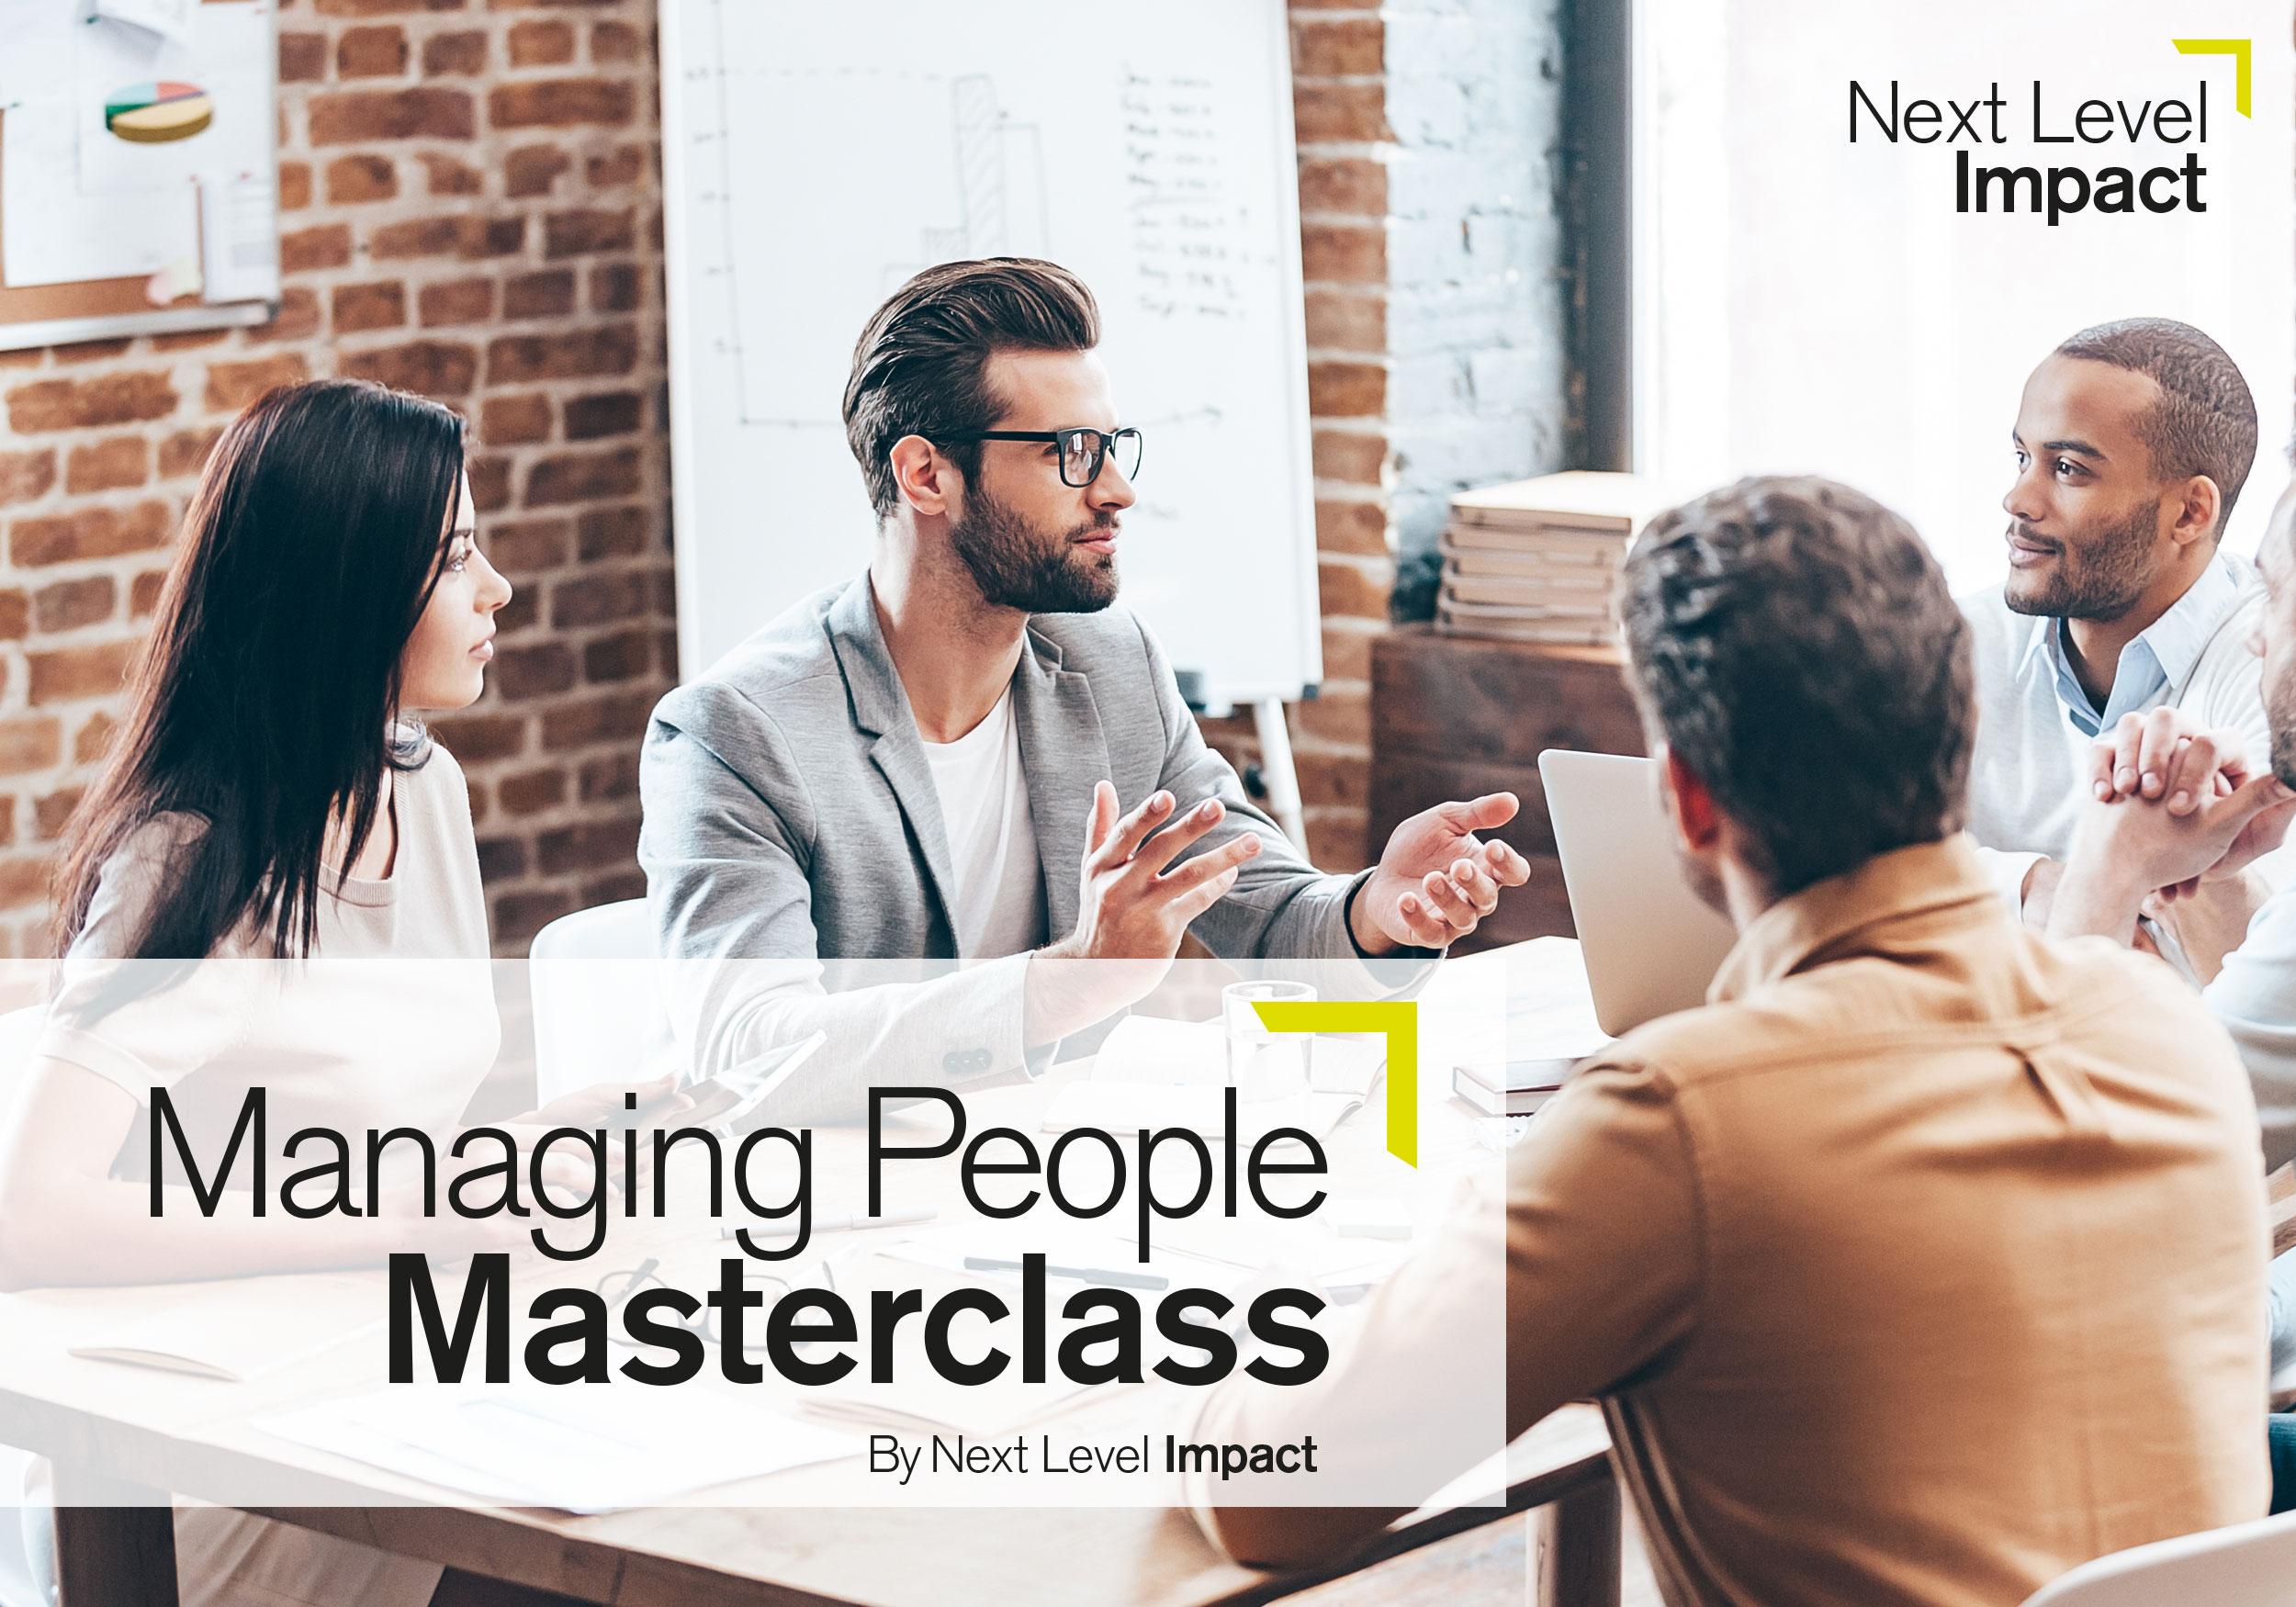 managing-people-masterclass.jpg